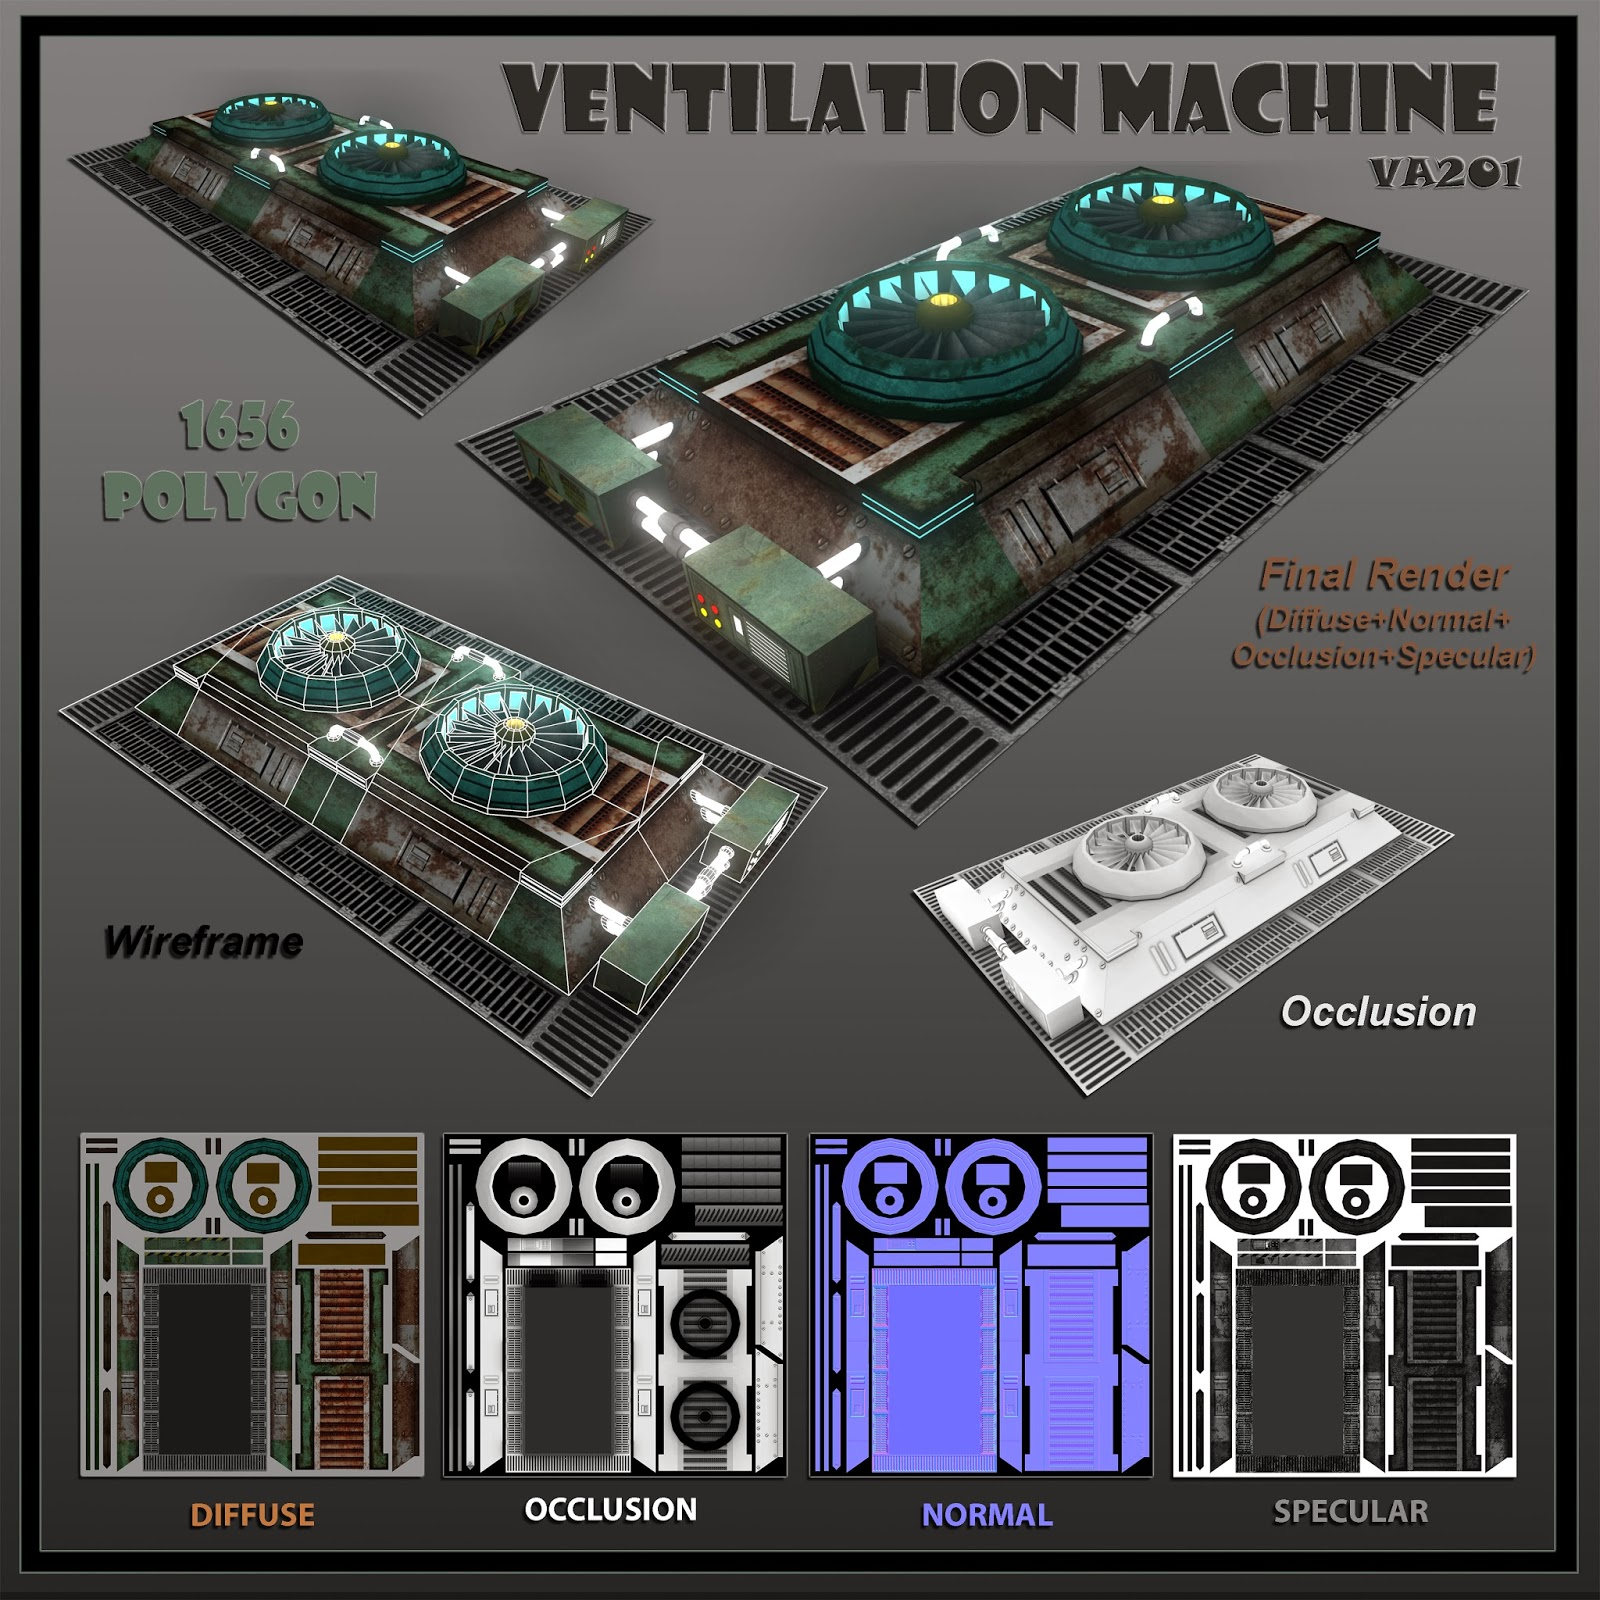 ventilation machine